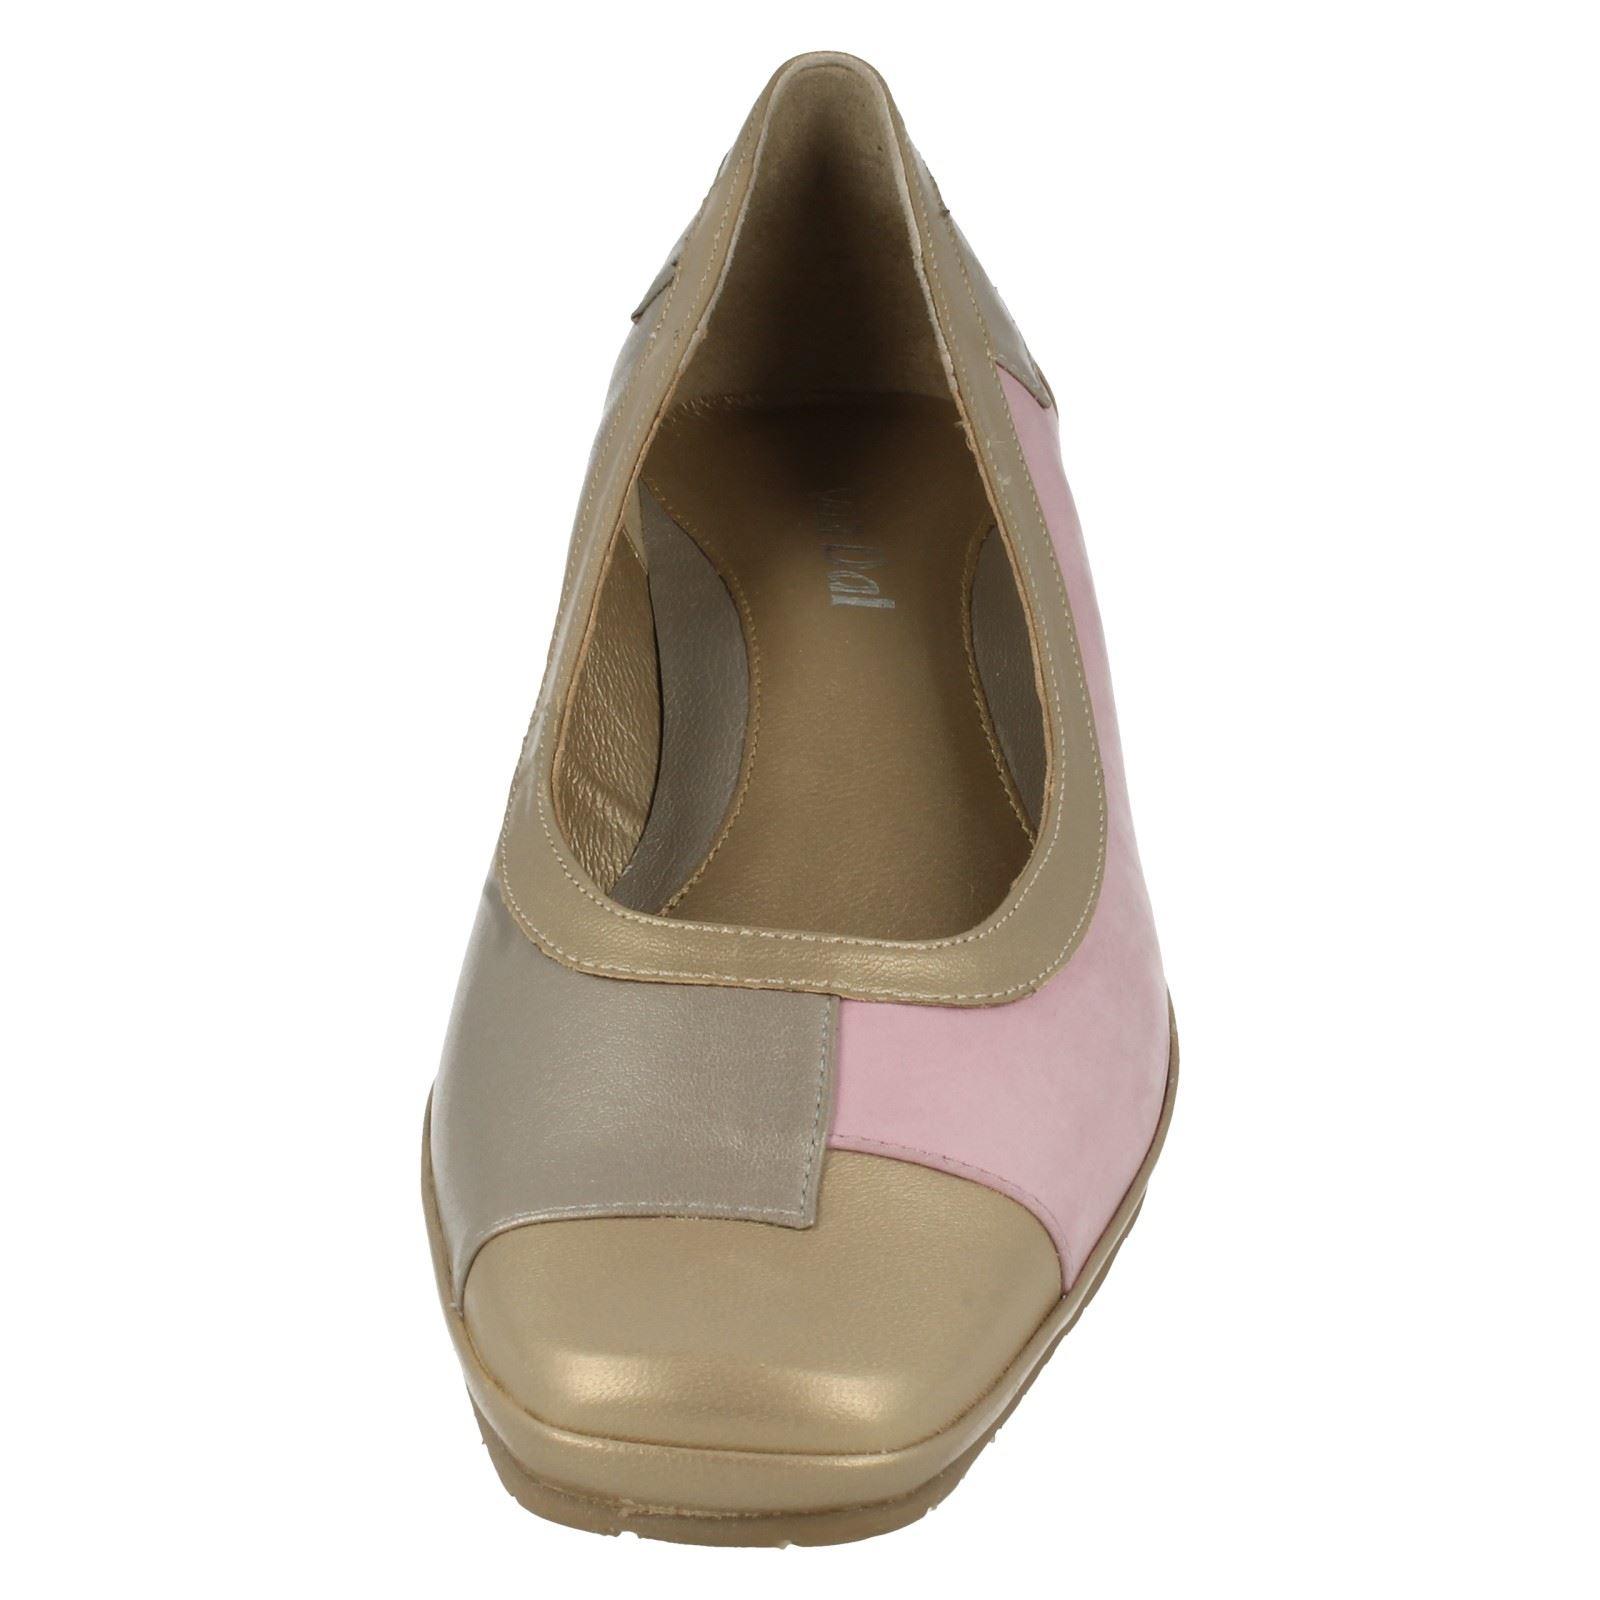 Ladies Van Dal Wedge Heeled Heeled Heeled shoes Haiti 8d4b49